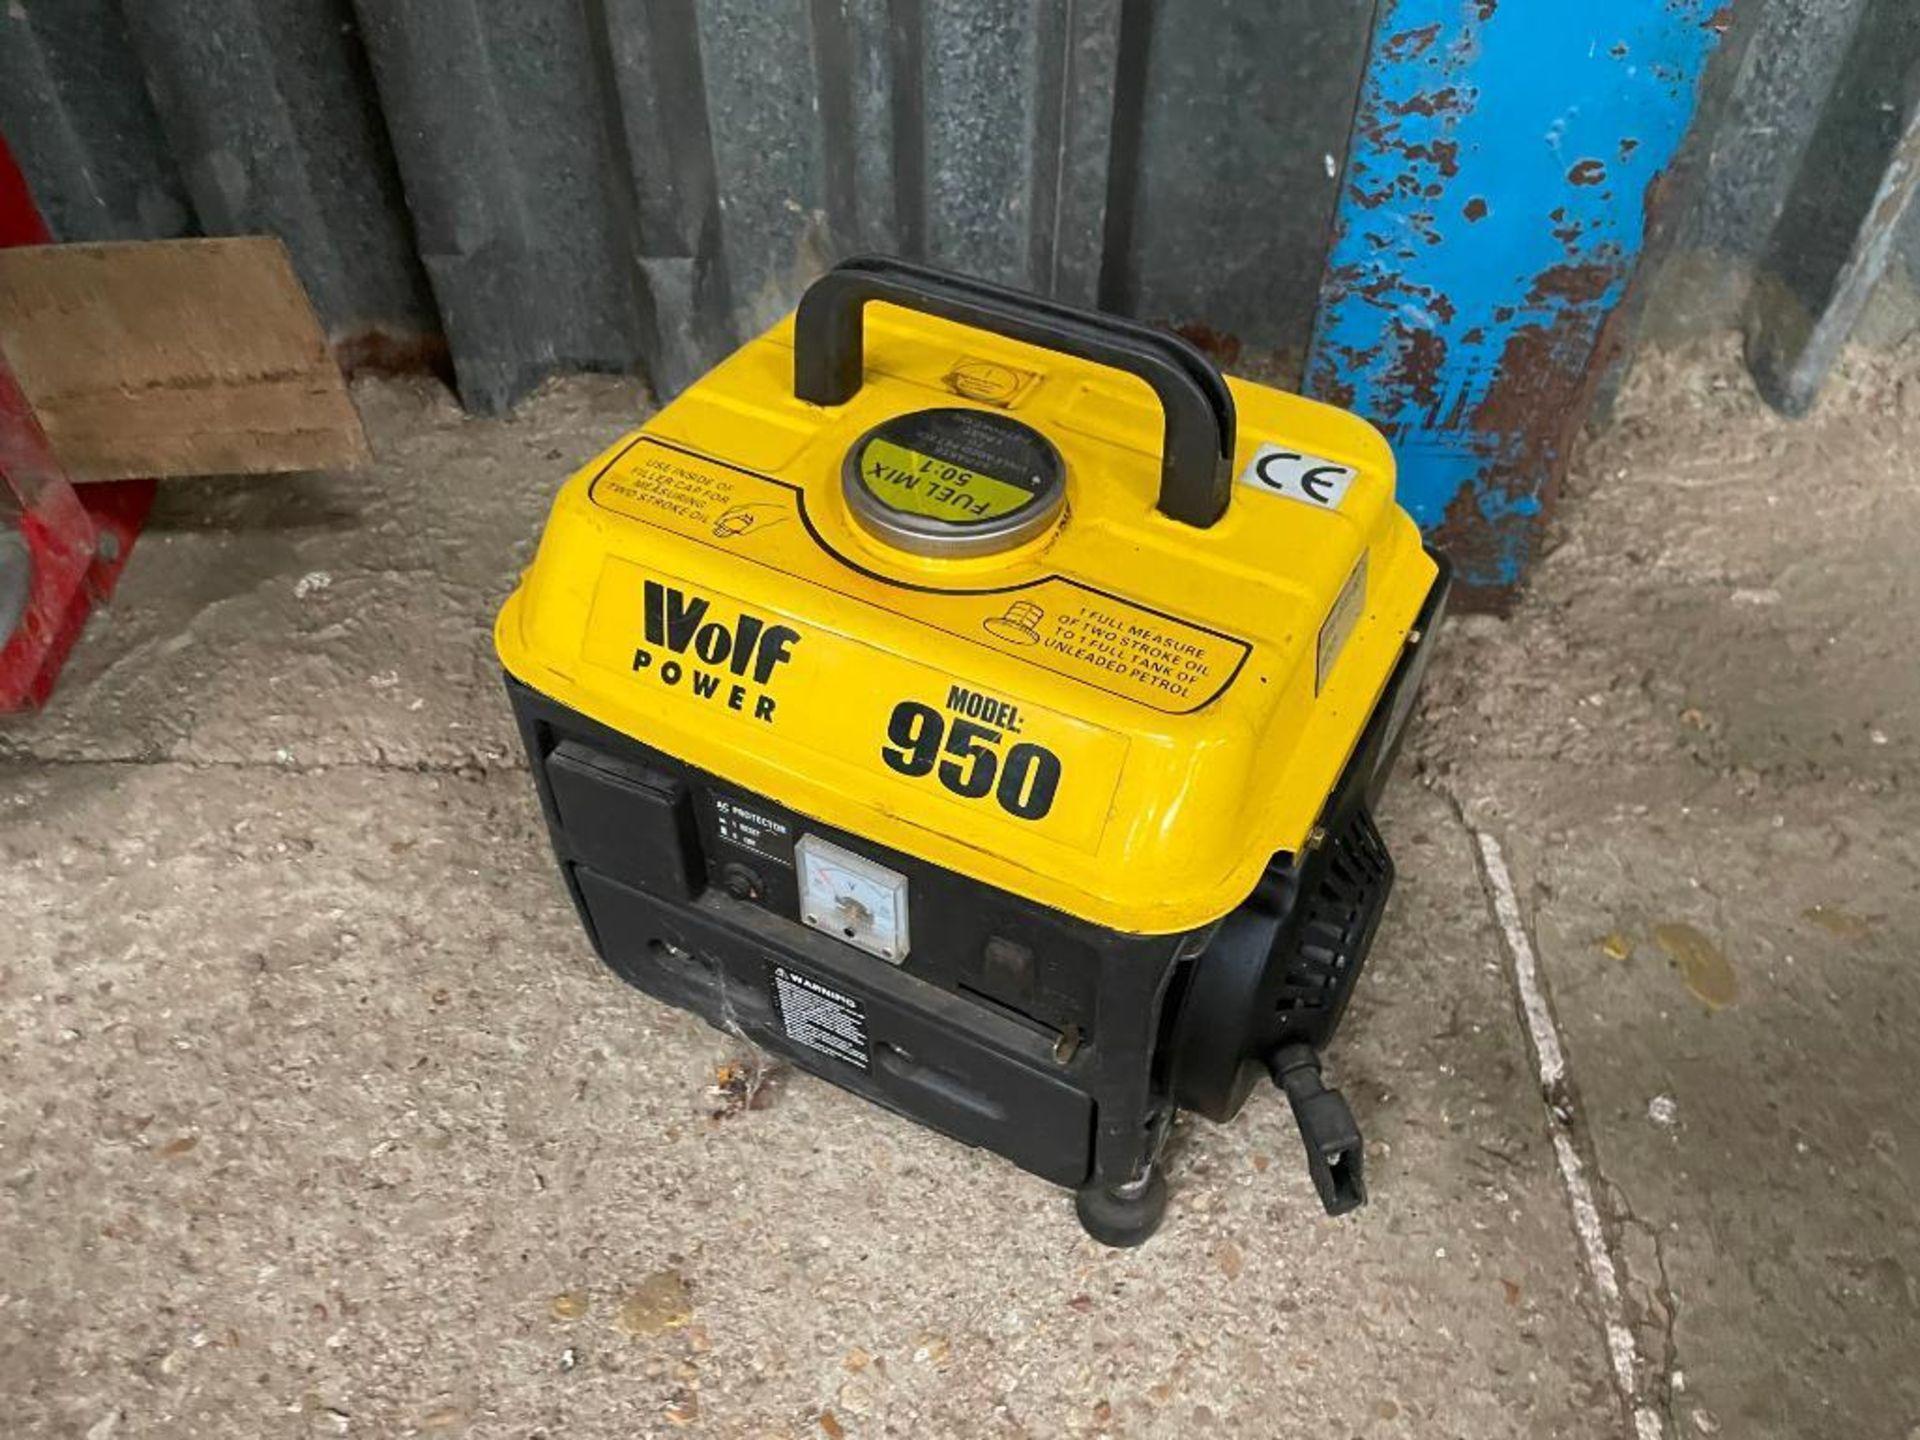 Wolf Power 950 2-stroke generator, 650wt - Image 2 of 2